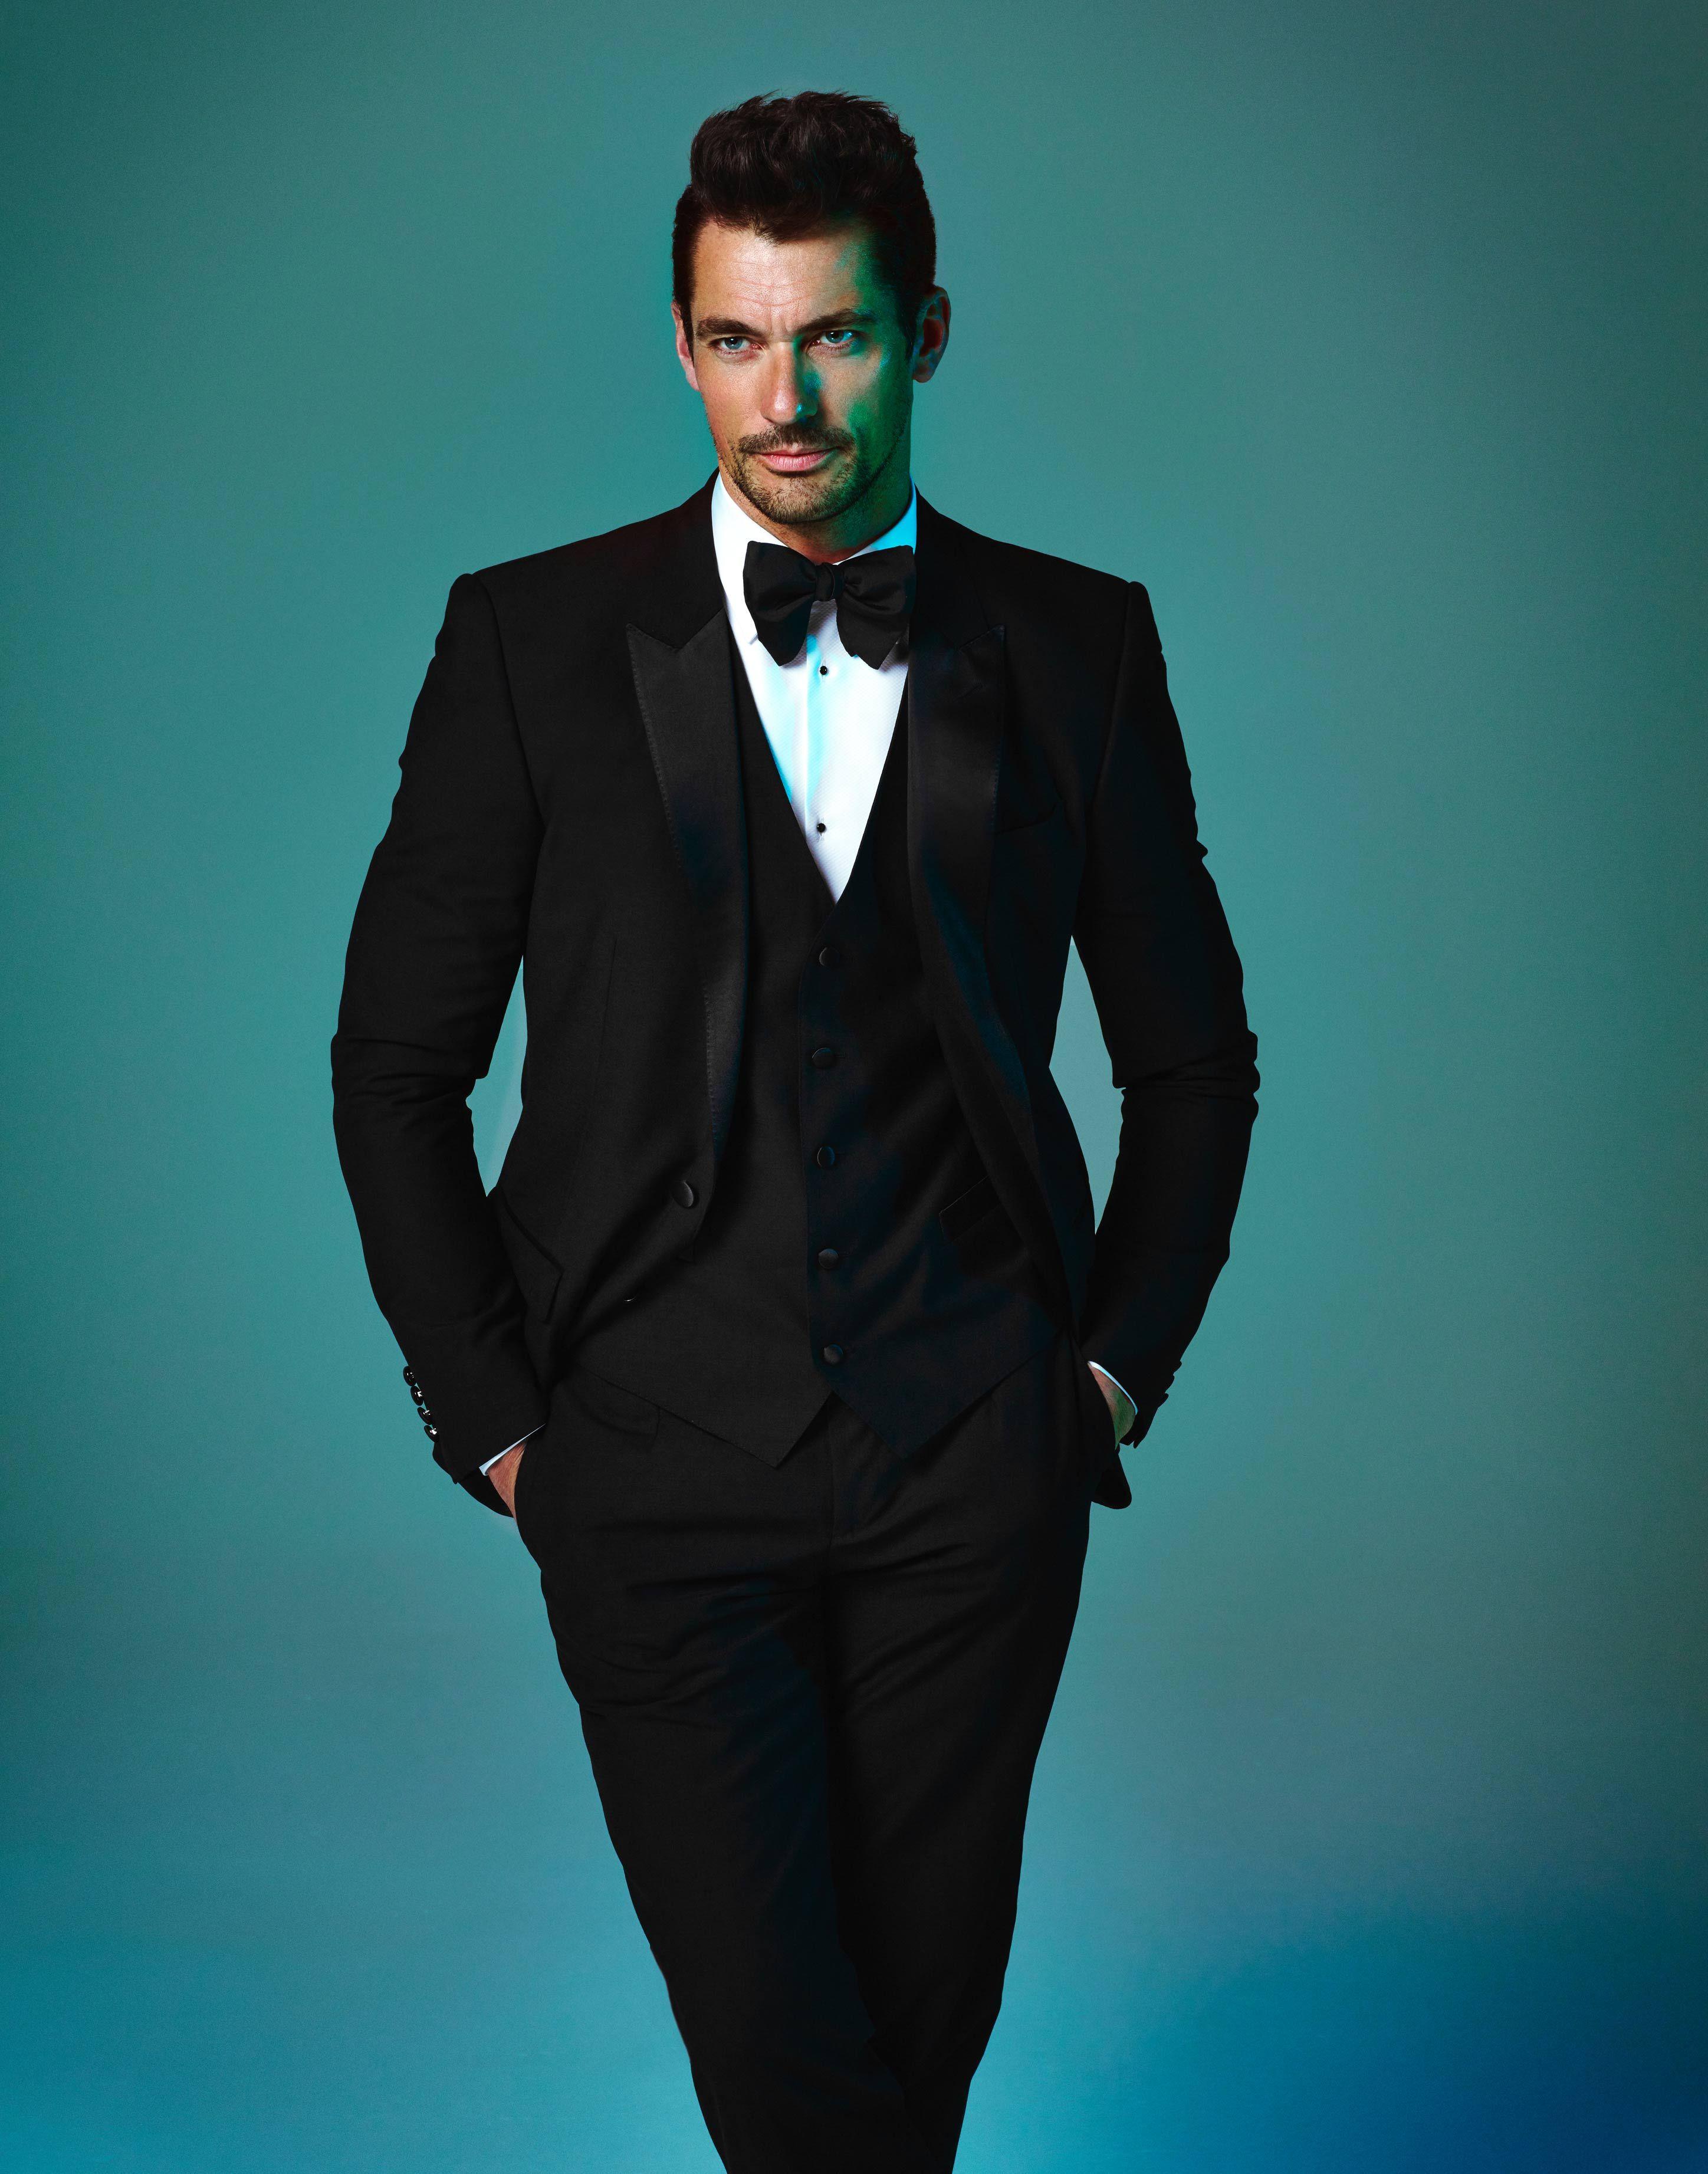 David Gandy is a Model Man | Pinterest | Bottega veneta, David gandy ...